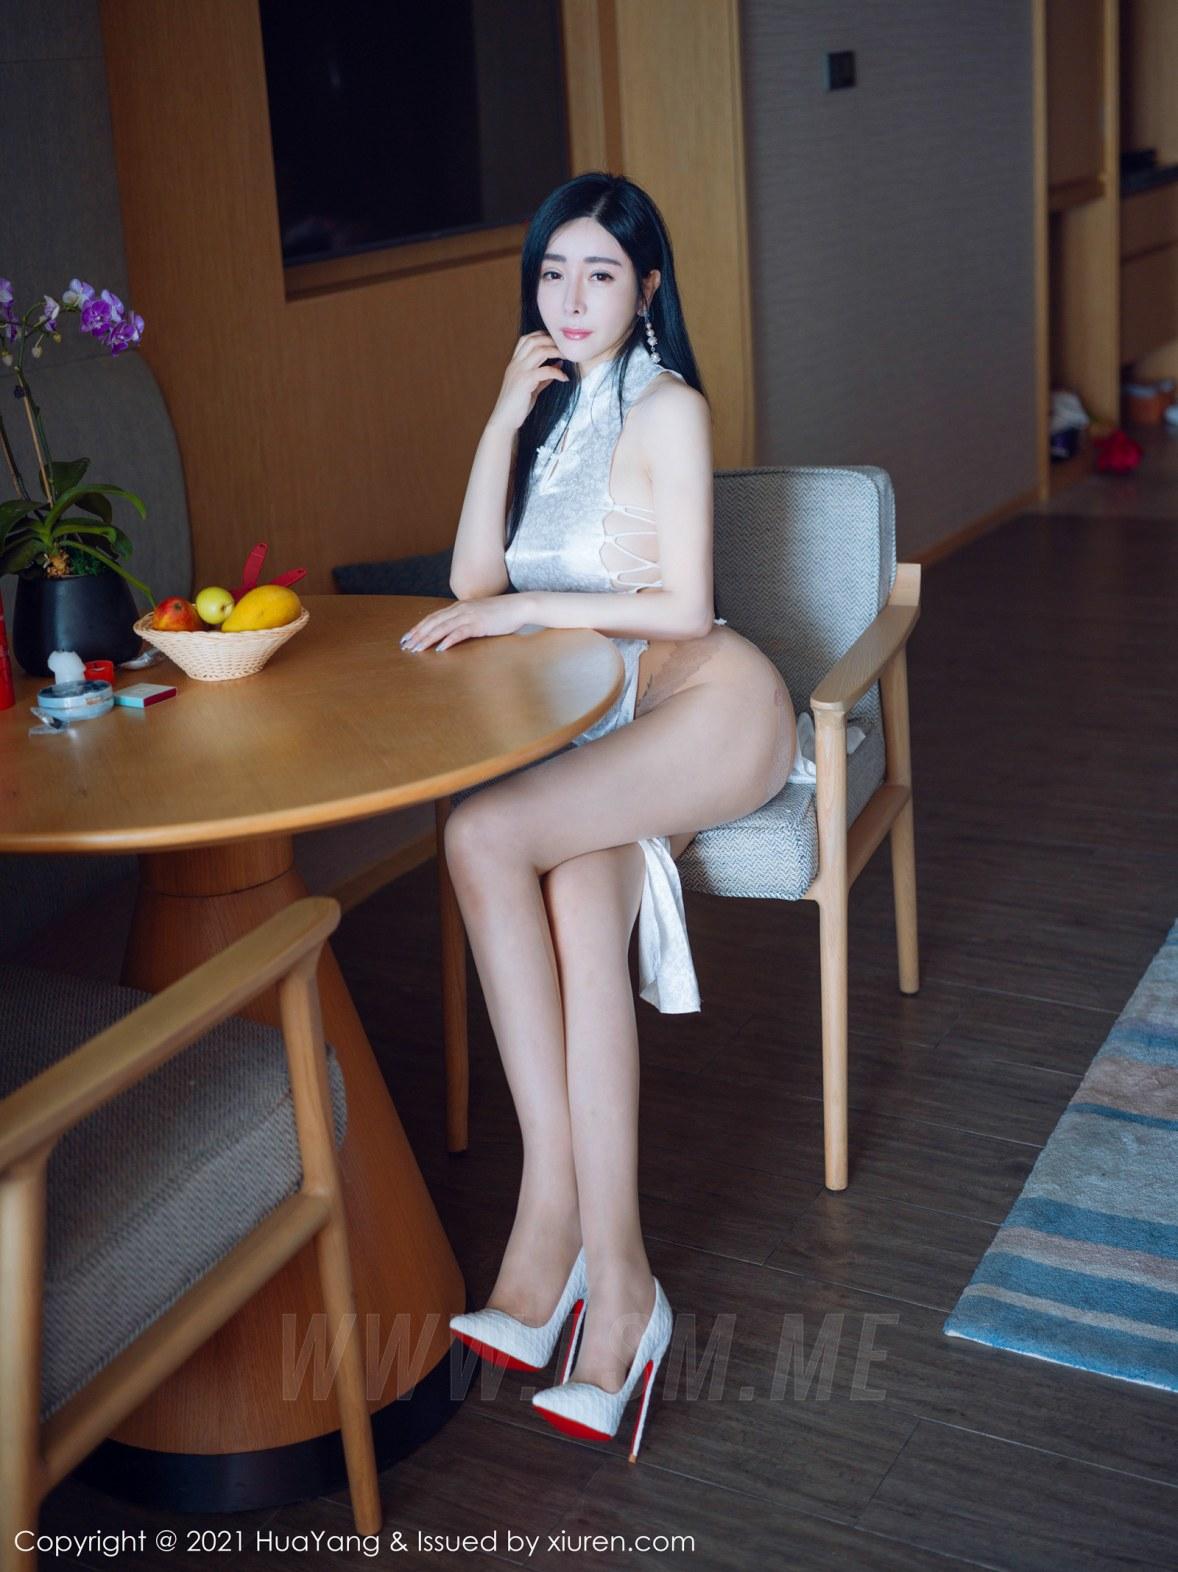 HuaYang 花漾show Vol.392 古典浪漫旗袍 允爾 三亚旅拍写真 - 3